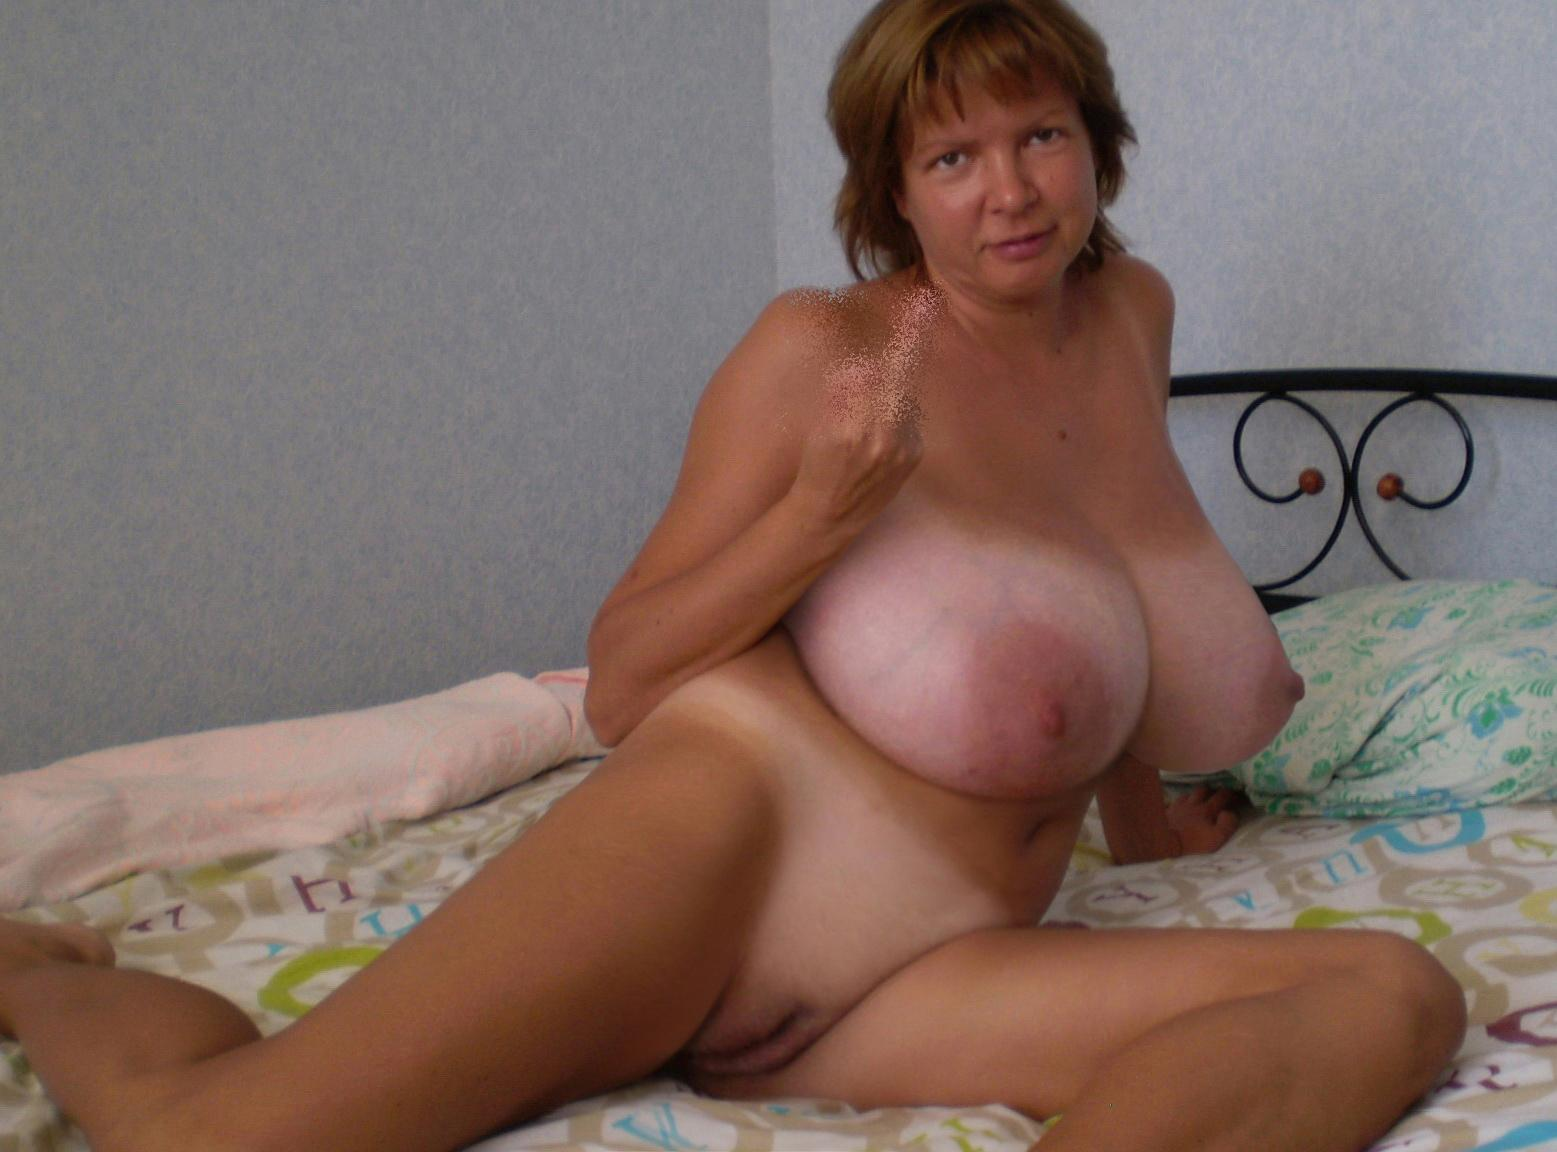 Порно на телефон 3gp и mp4 форматы эротика xxx на